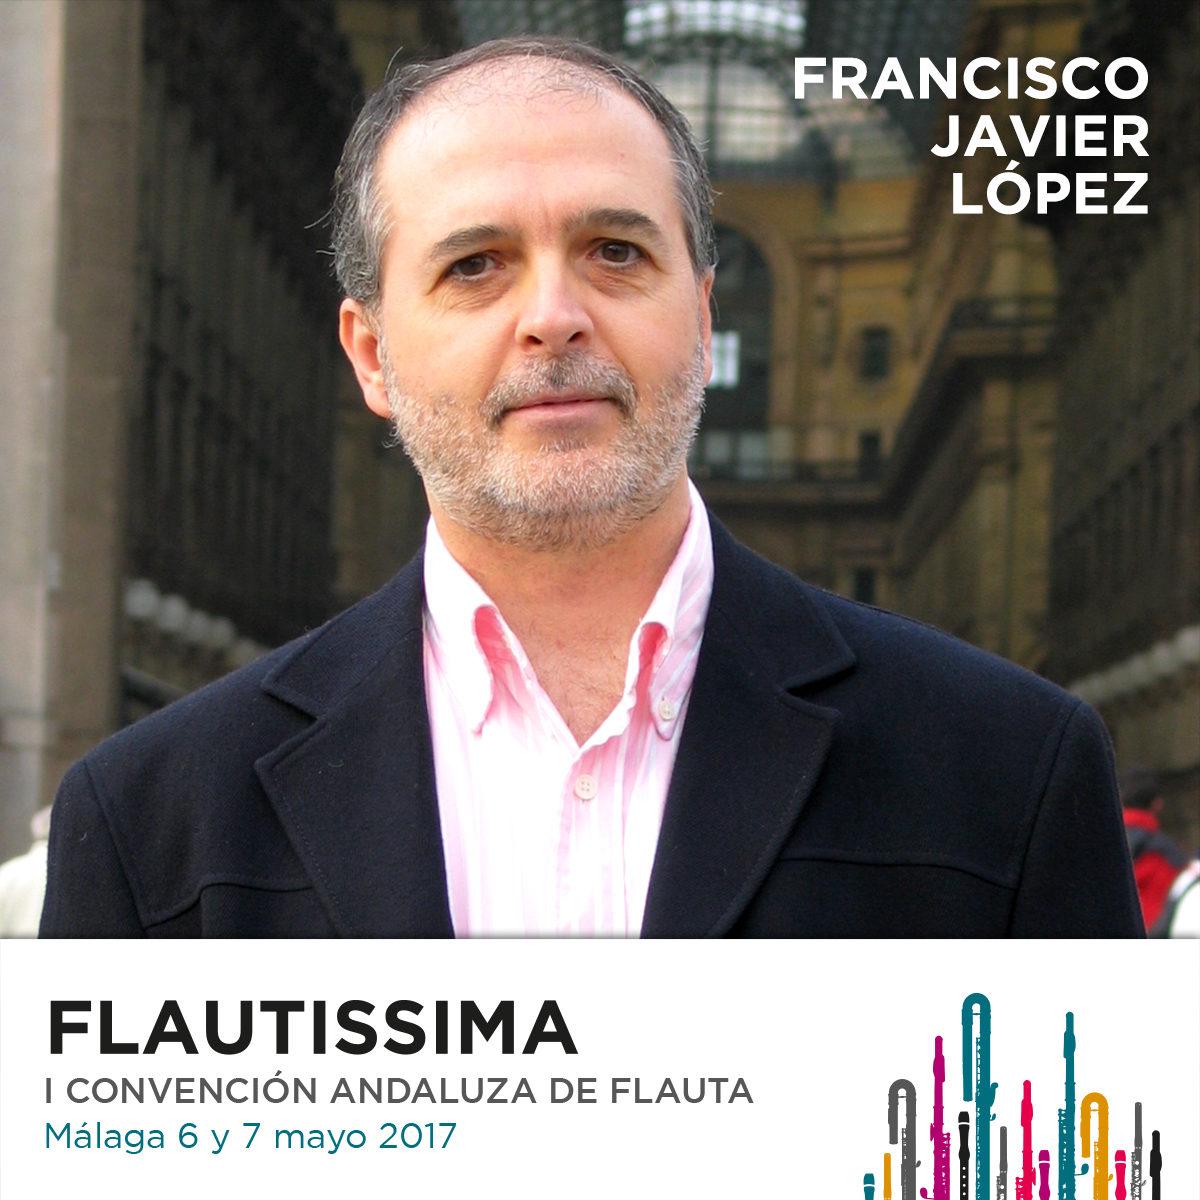 Francisco Javier Lopez Flautissima